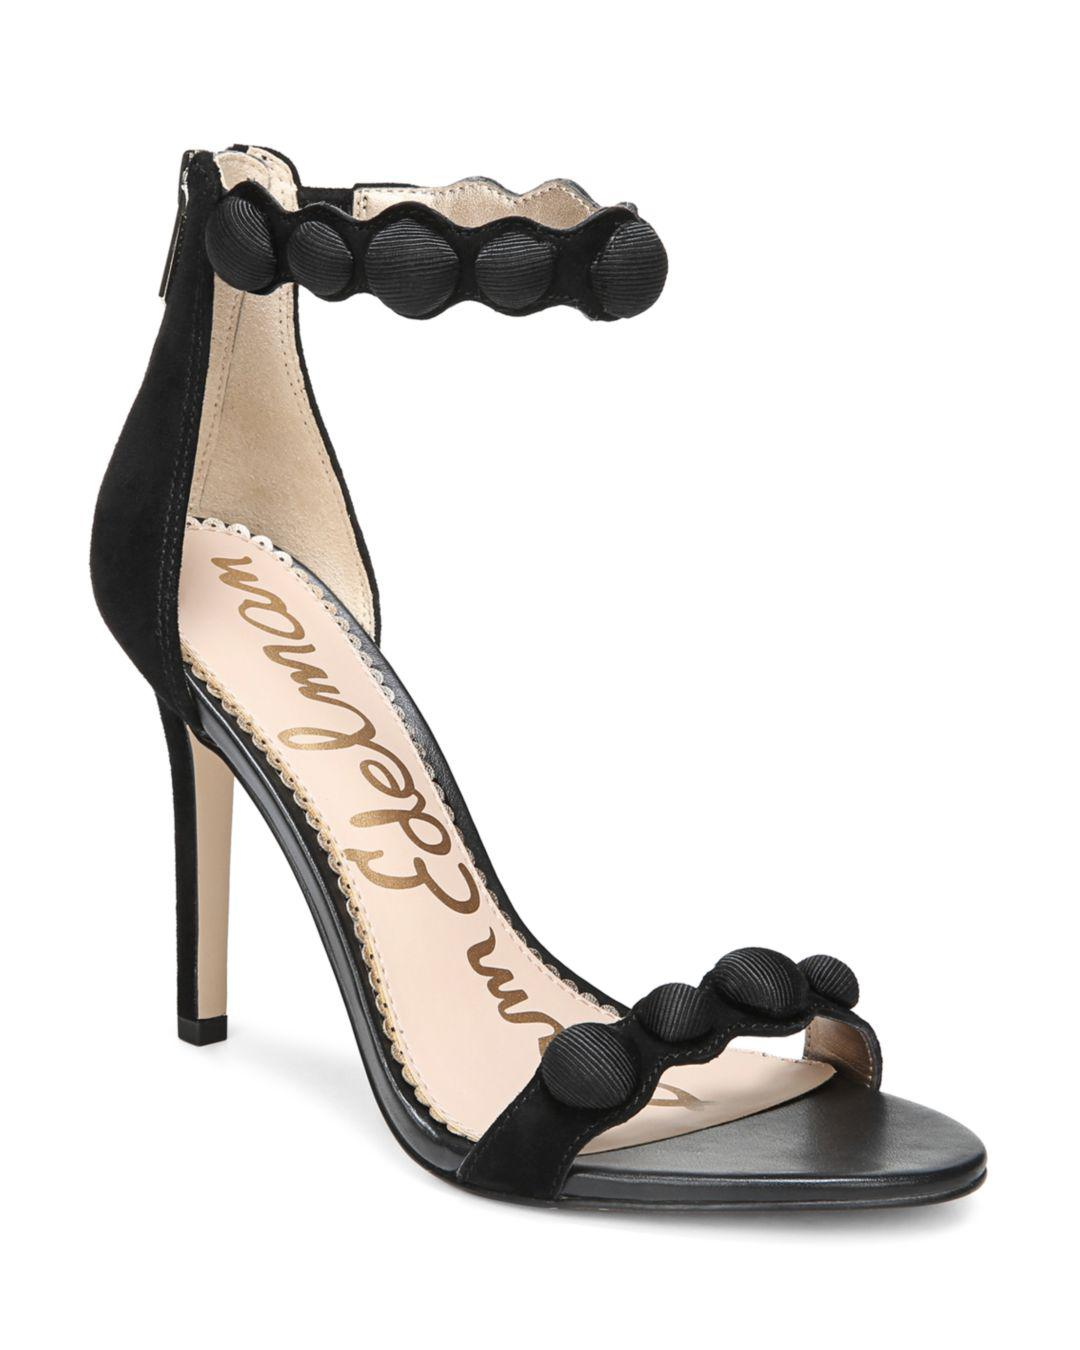 229a2785449 Sam Edelman Women s Addison Suede High-heel Ankle Strap Sandals in ...